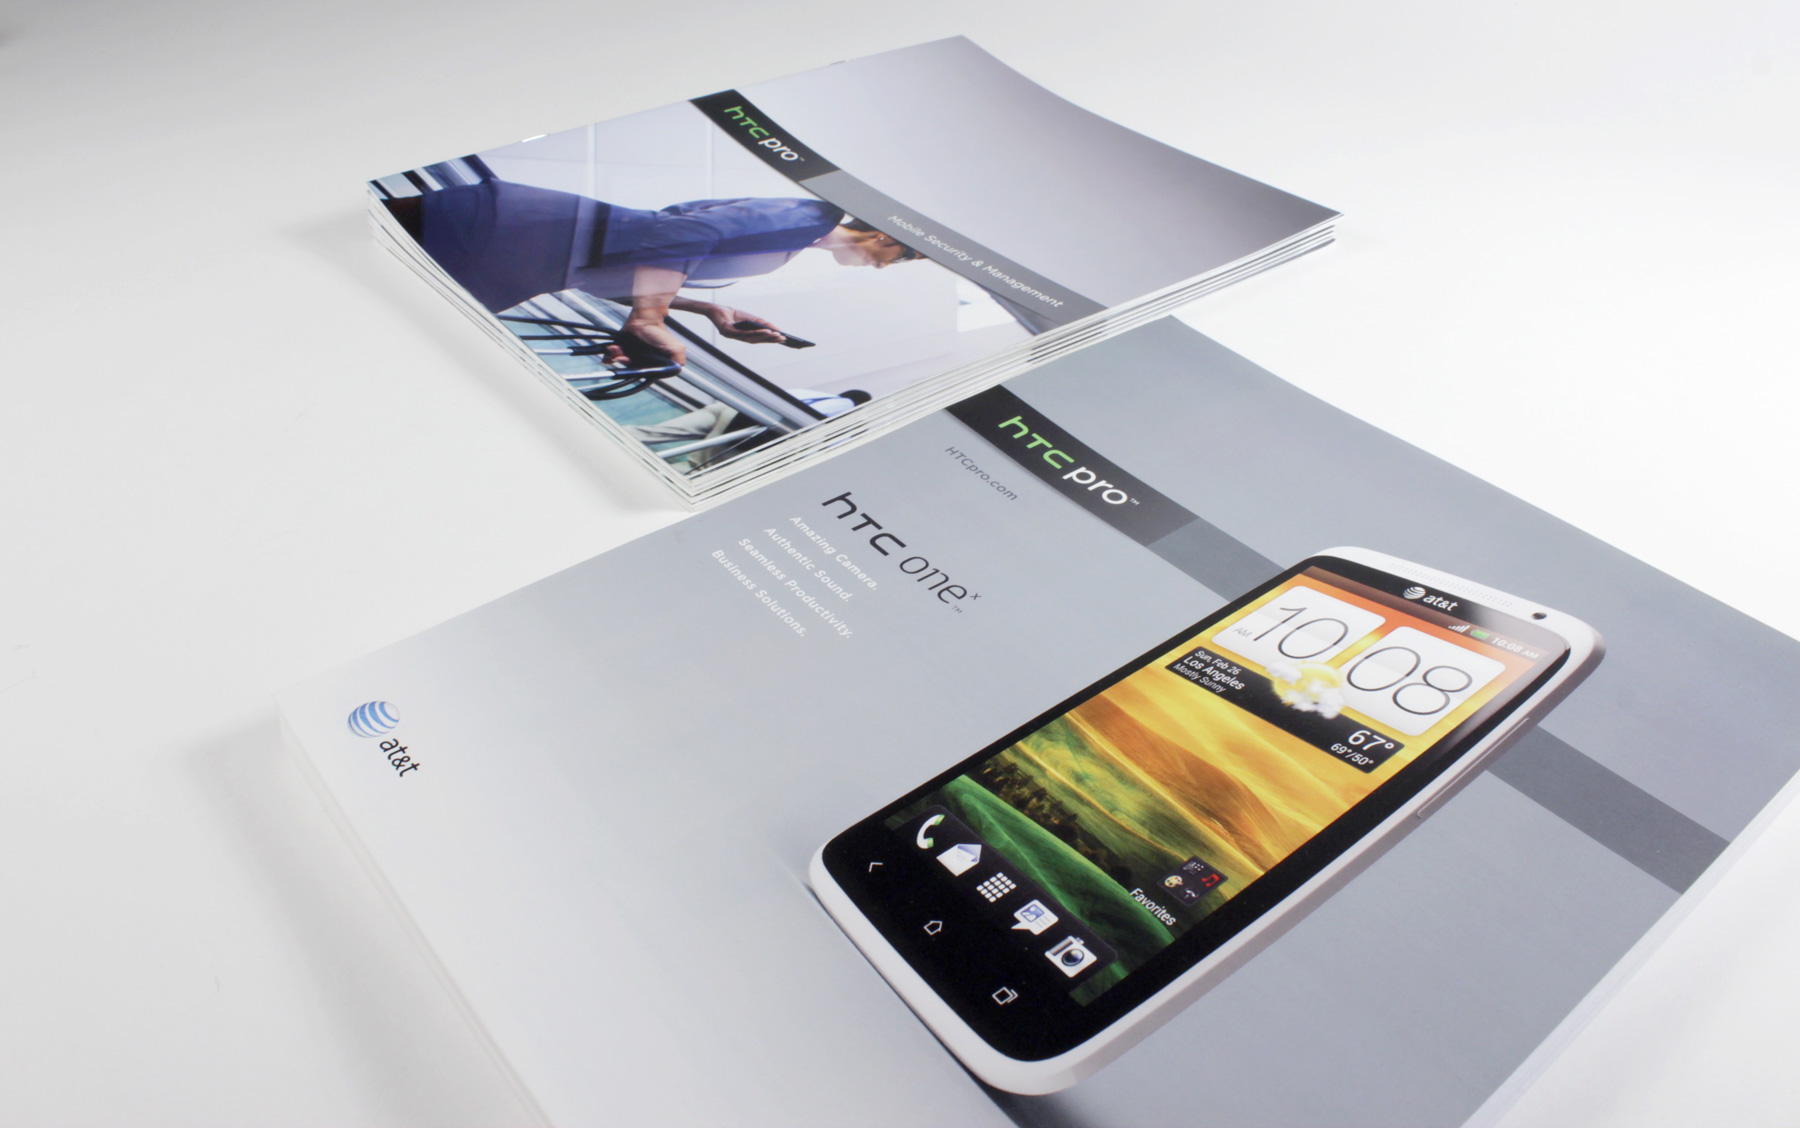 HTC Pro HTC One Model Manual